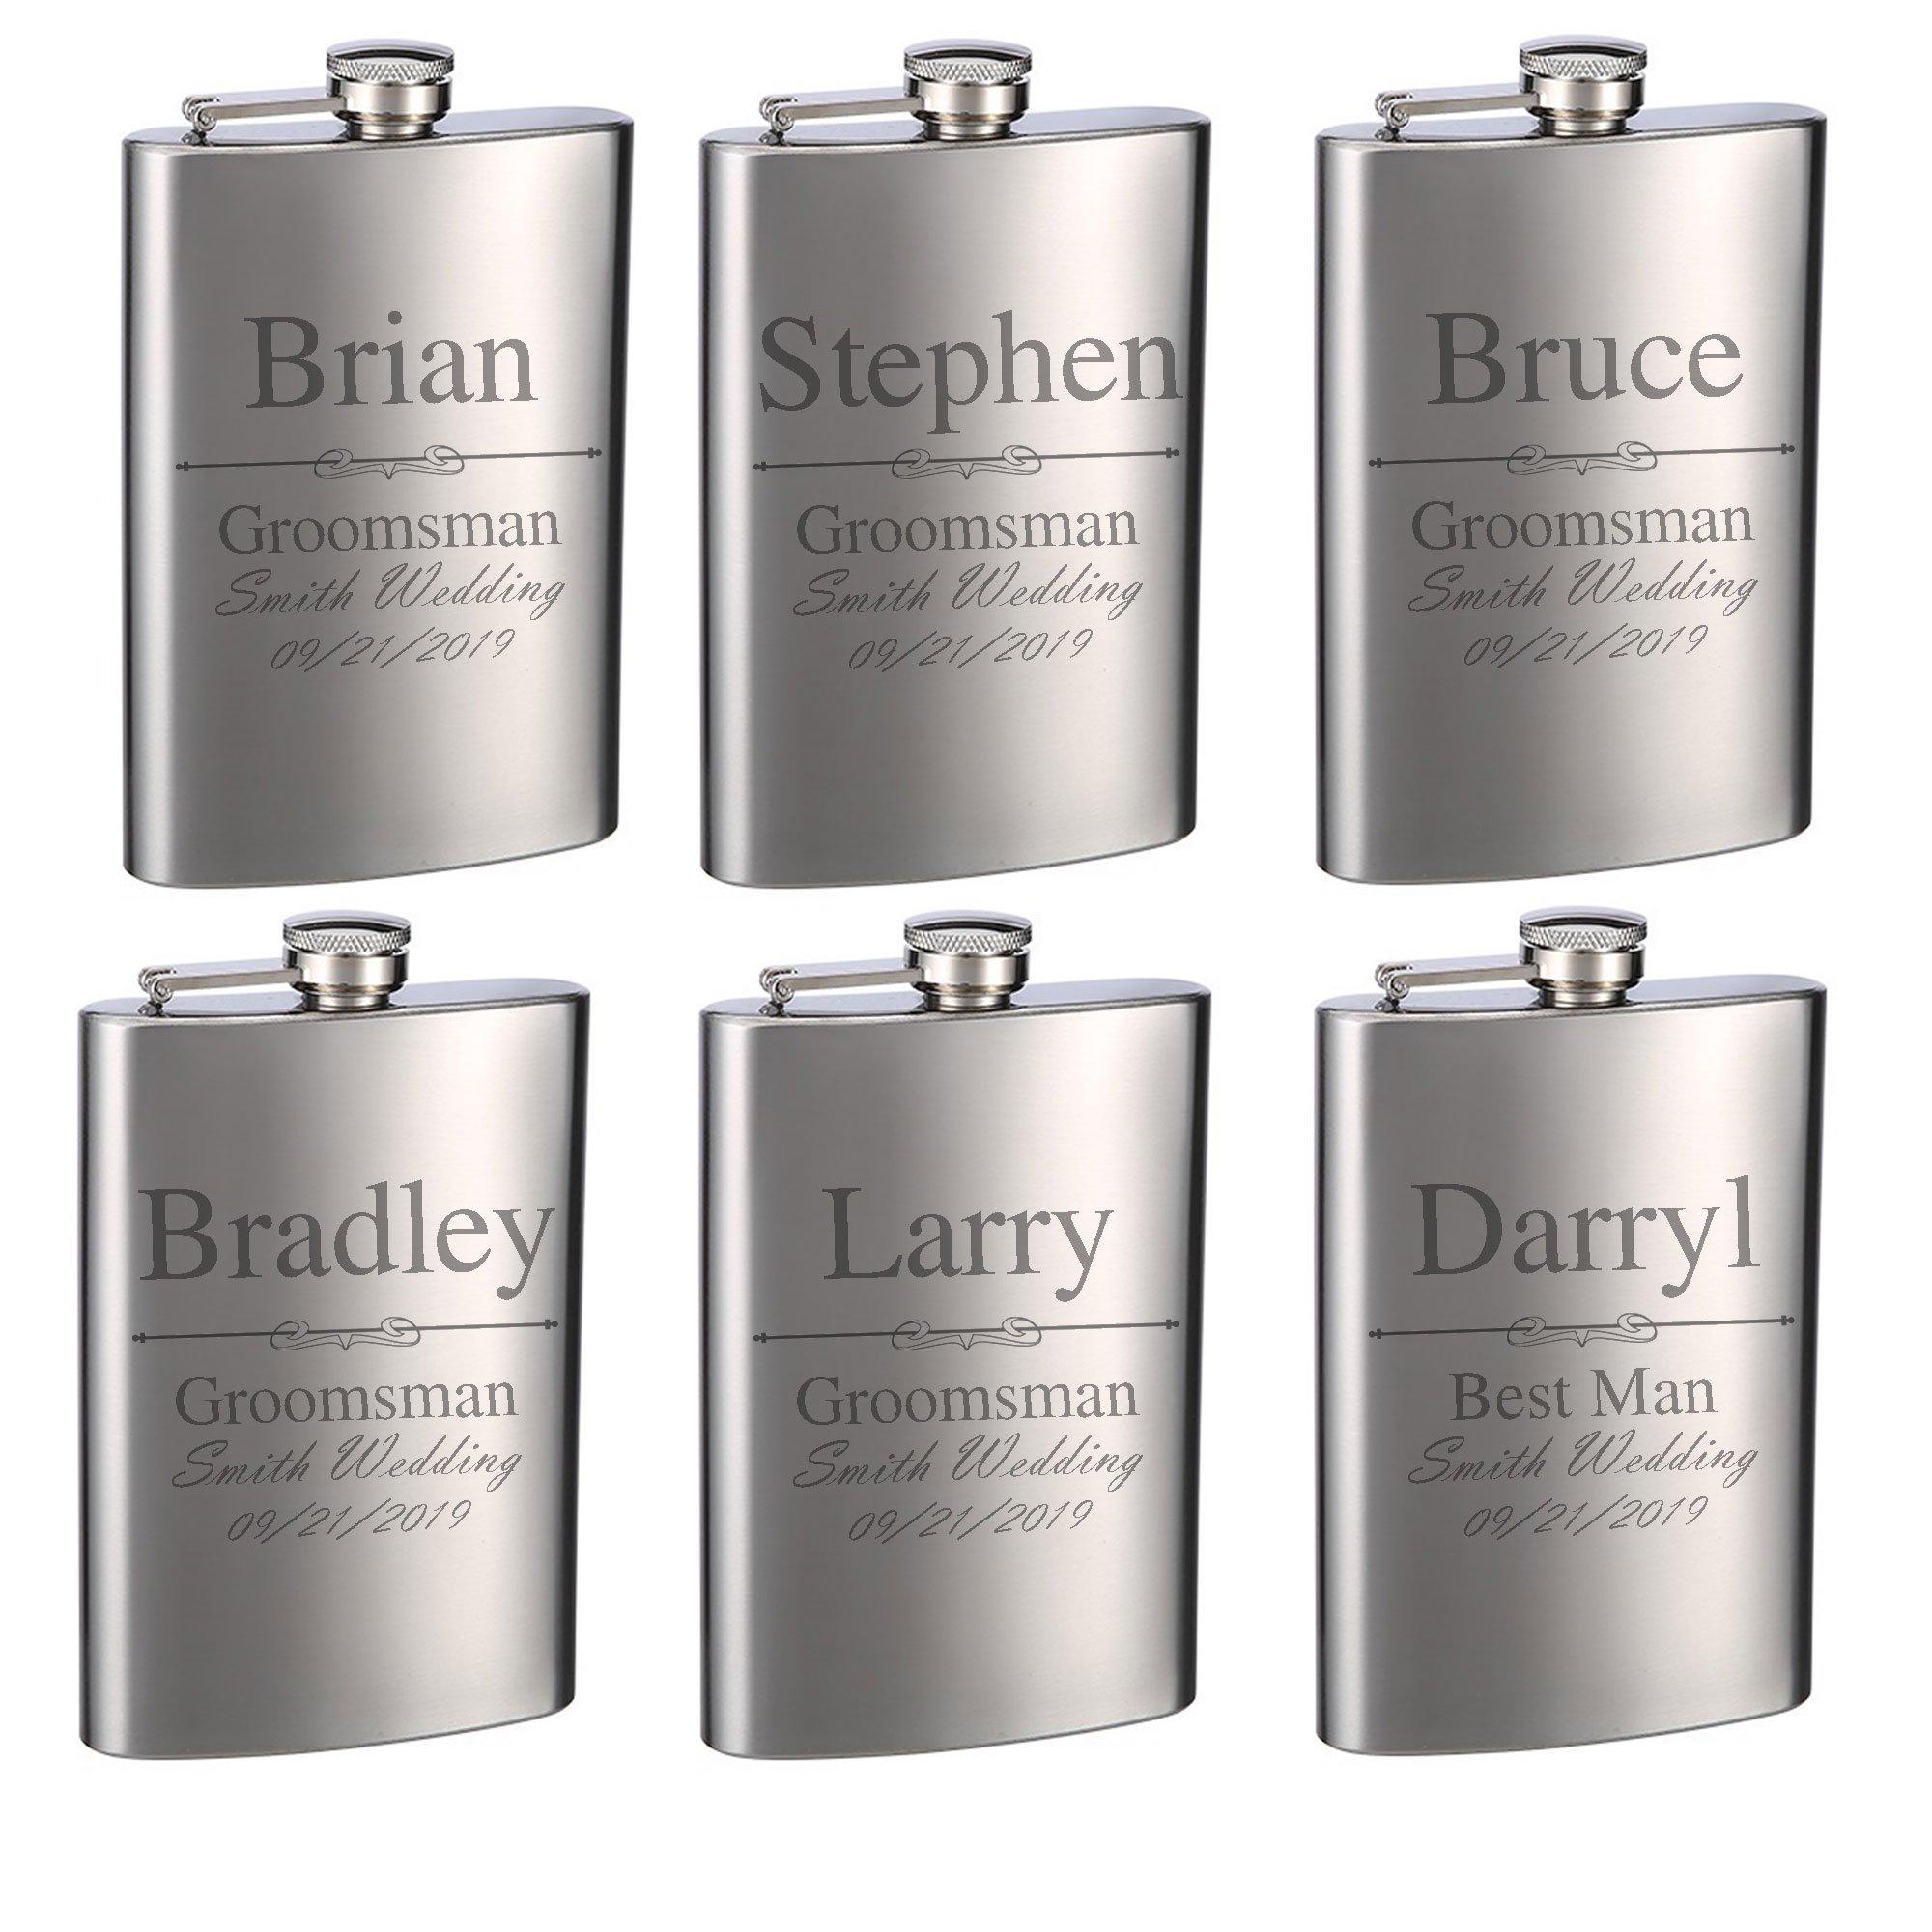 Top Shelf Flasks Personalized Custom Engraved 8oz Stainless Steel Groomsman Gift Flasks for Weddings, True Metal Etching Lasts a Lifetime, Set of 6 by TOP SHELF FLASKS